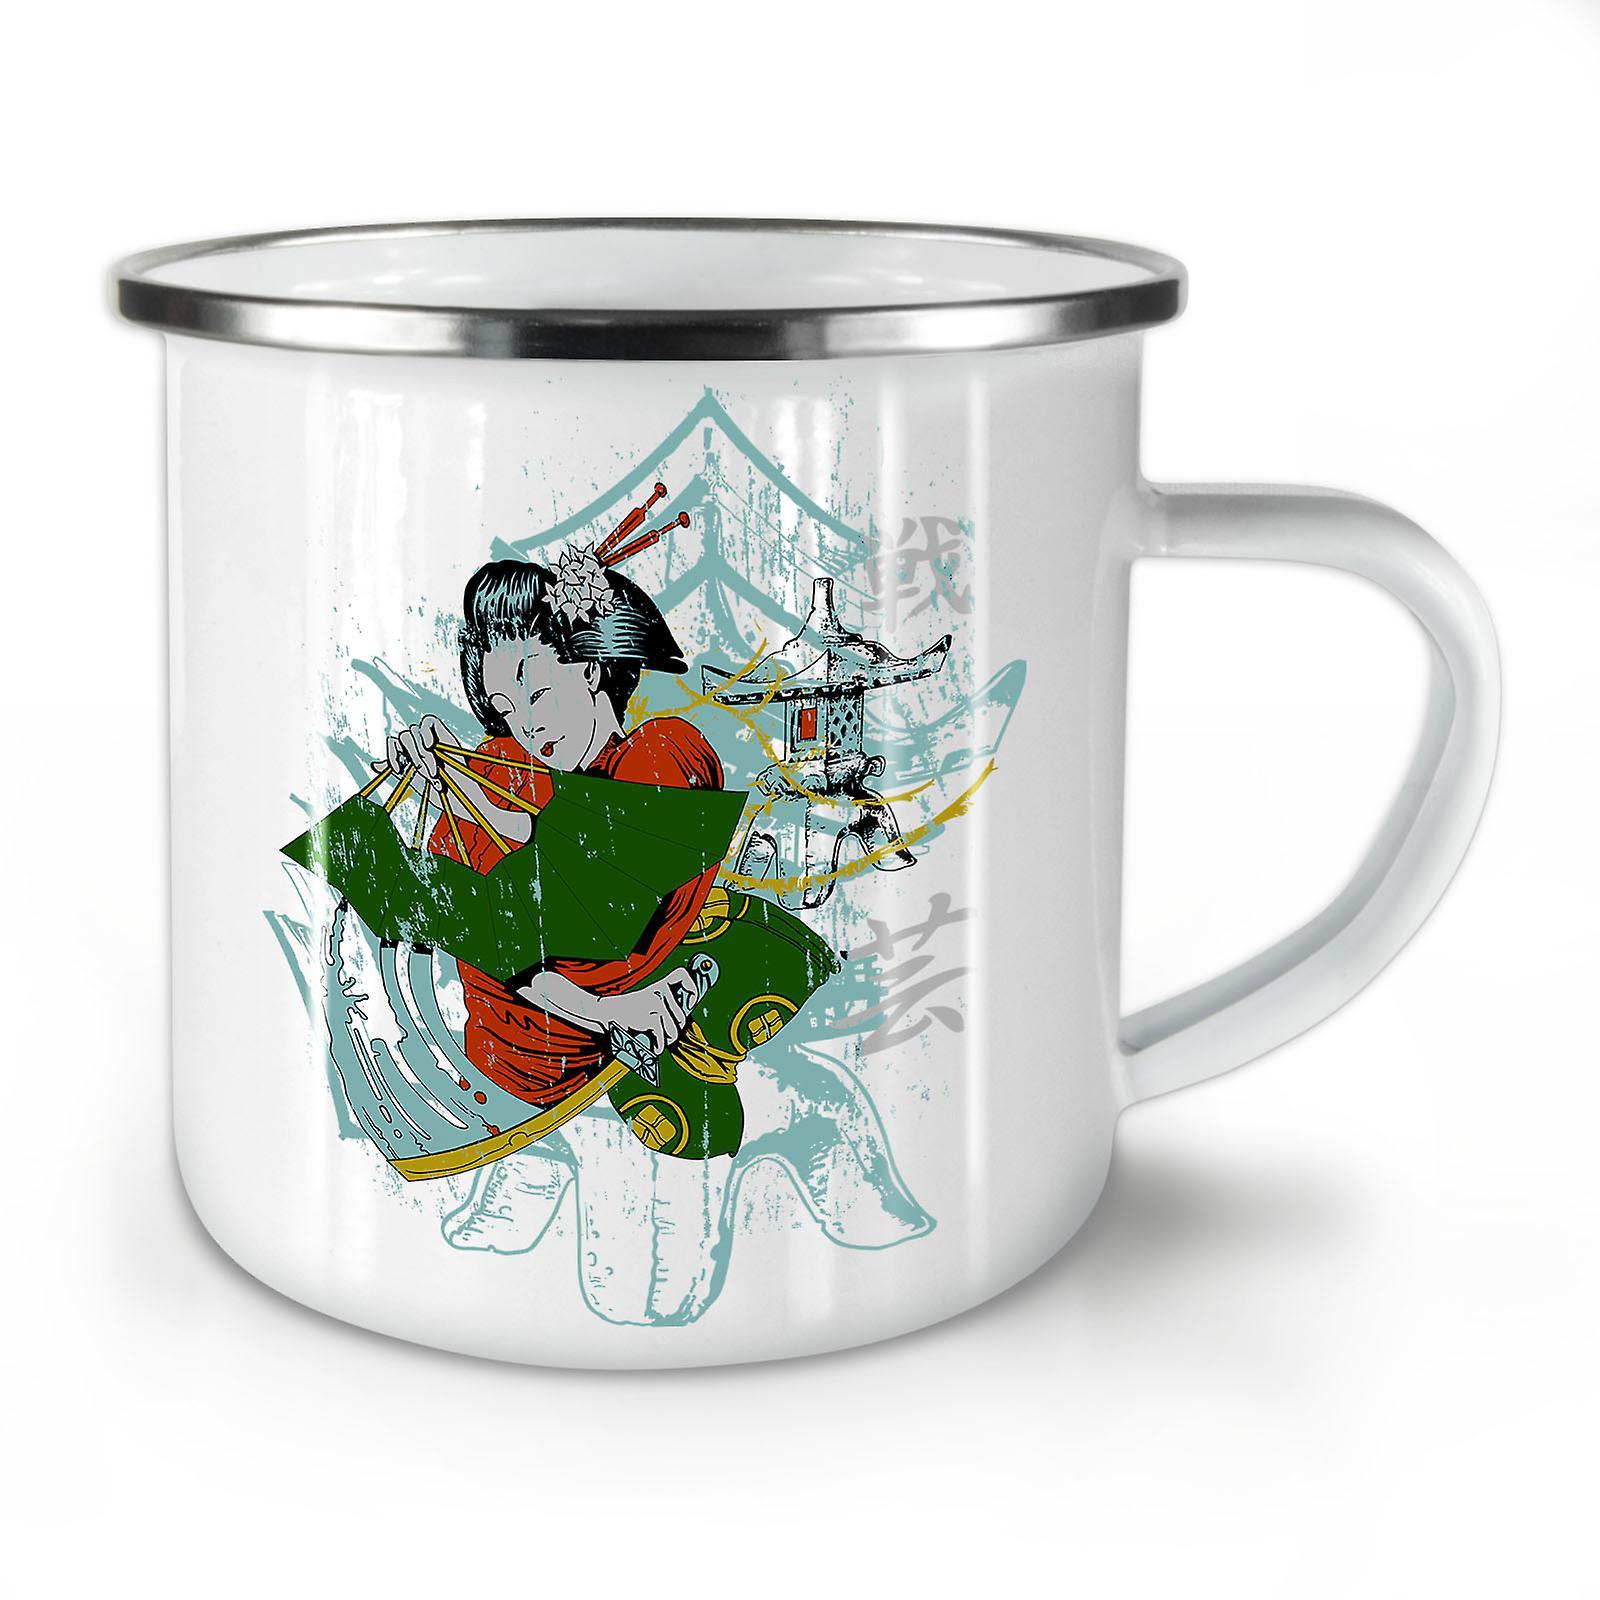 Nouvelle Folklore Fantasy OzWellcoda Café Mug10 Émail Whitetea Japon uKJ5l3F1Tc